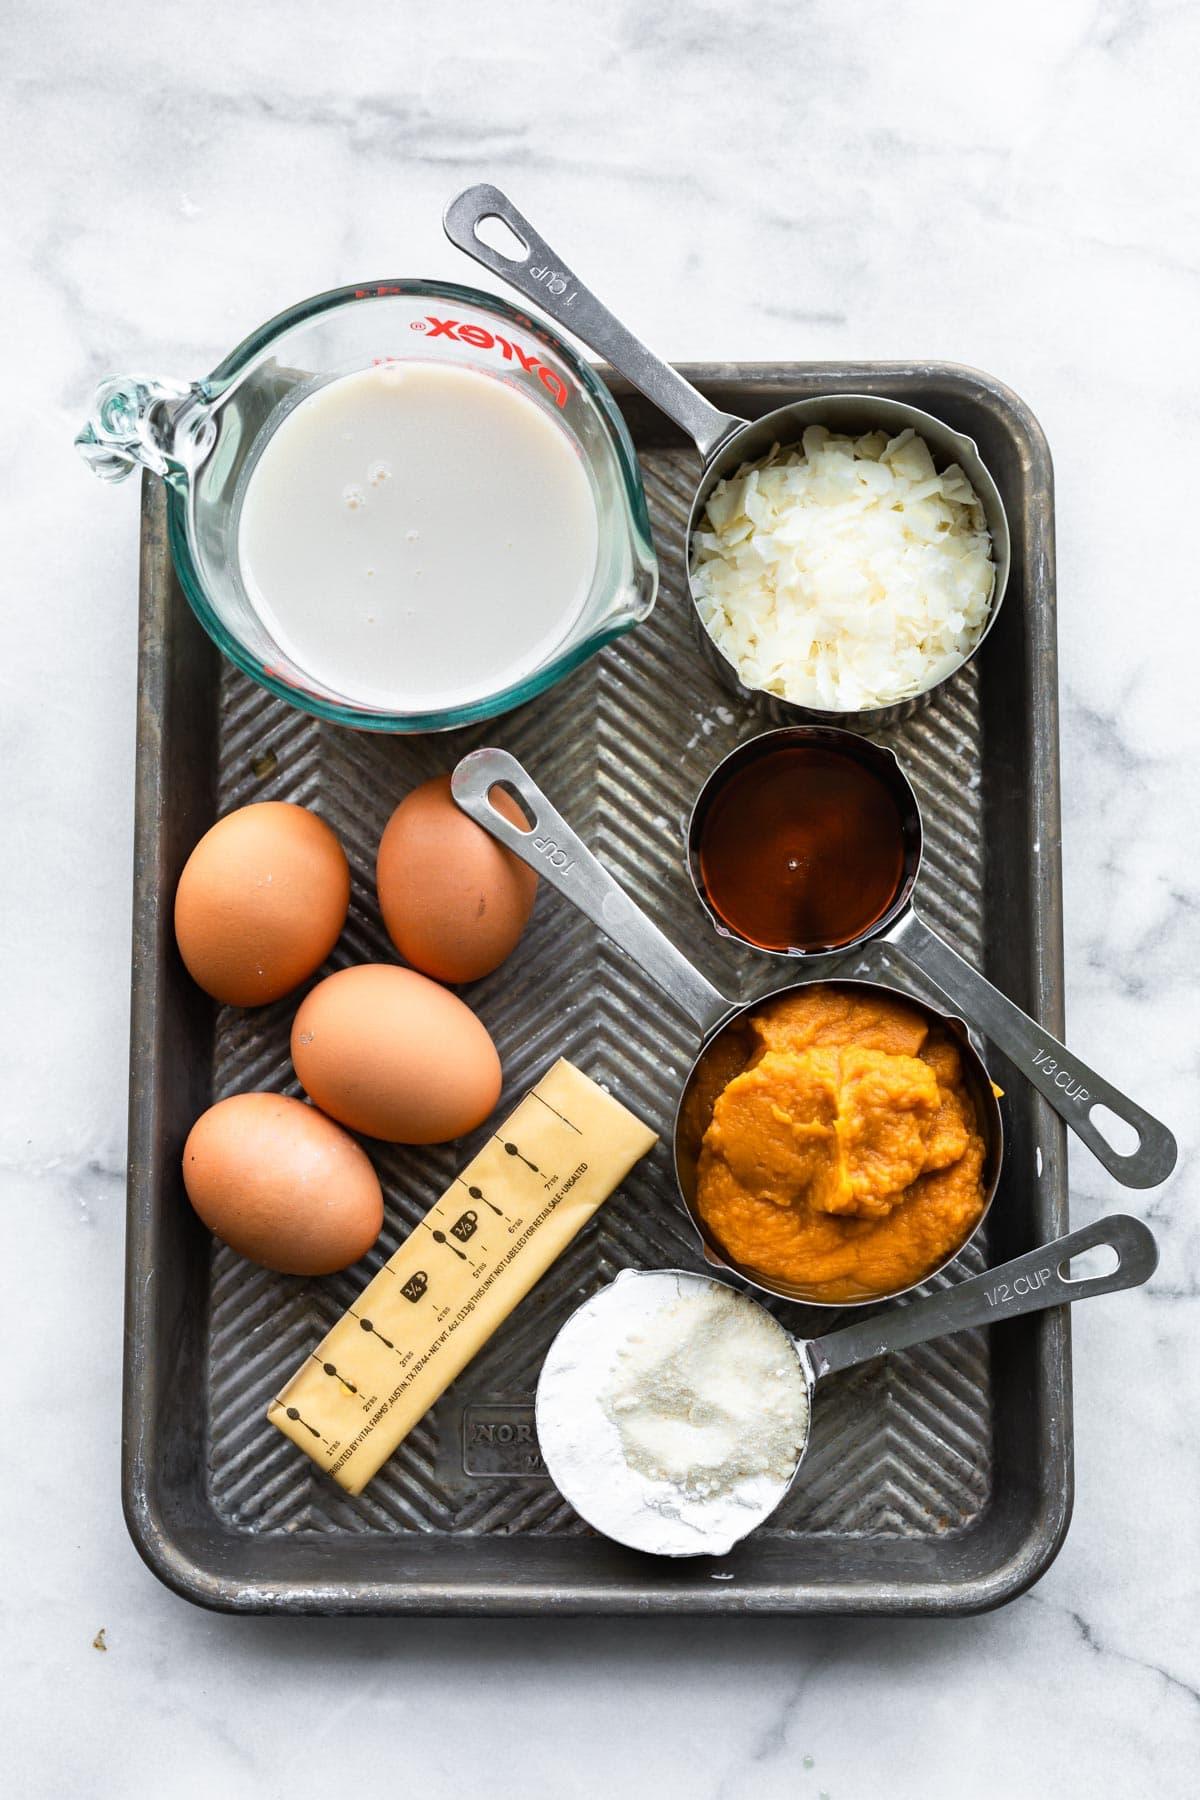 overhead photo: ingredients on baking sheet to make Paleo sweet potato pie recipe